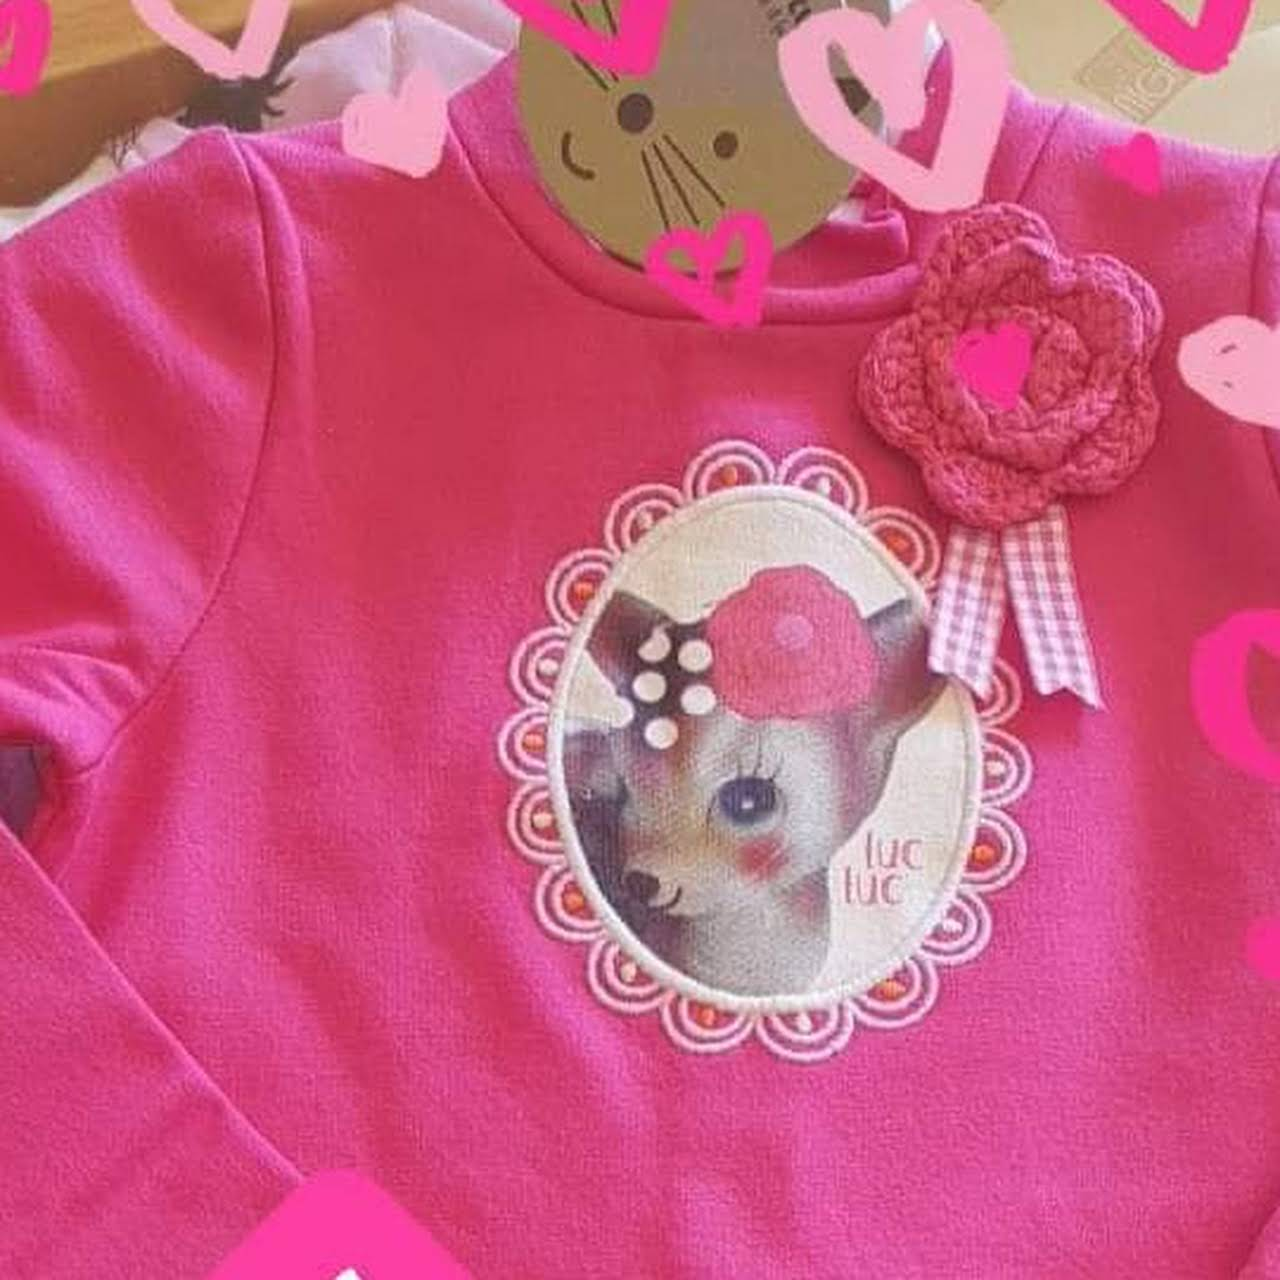 c158429e265d Fairyland Παιδικη μοδα - Children's Clothing Store in Άνοιξη